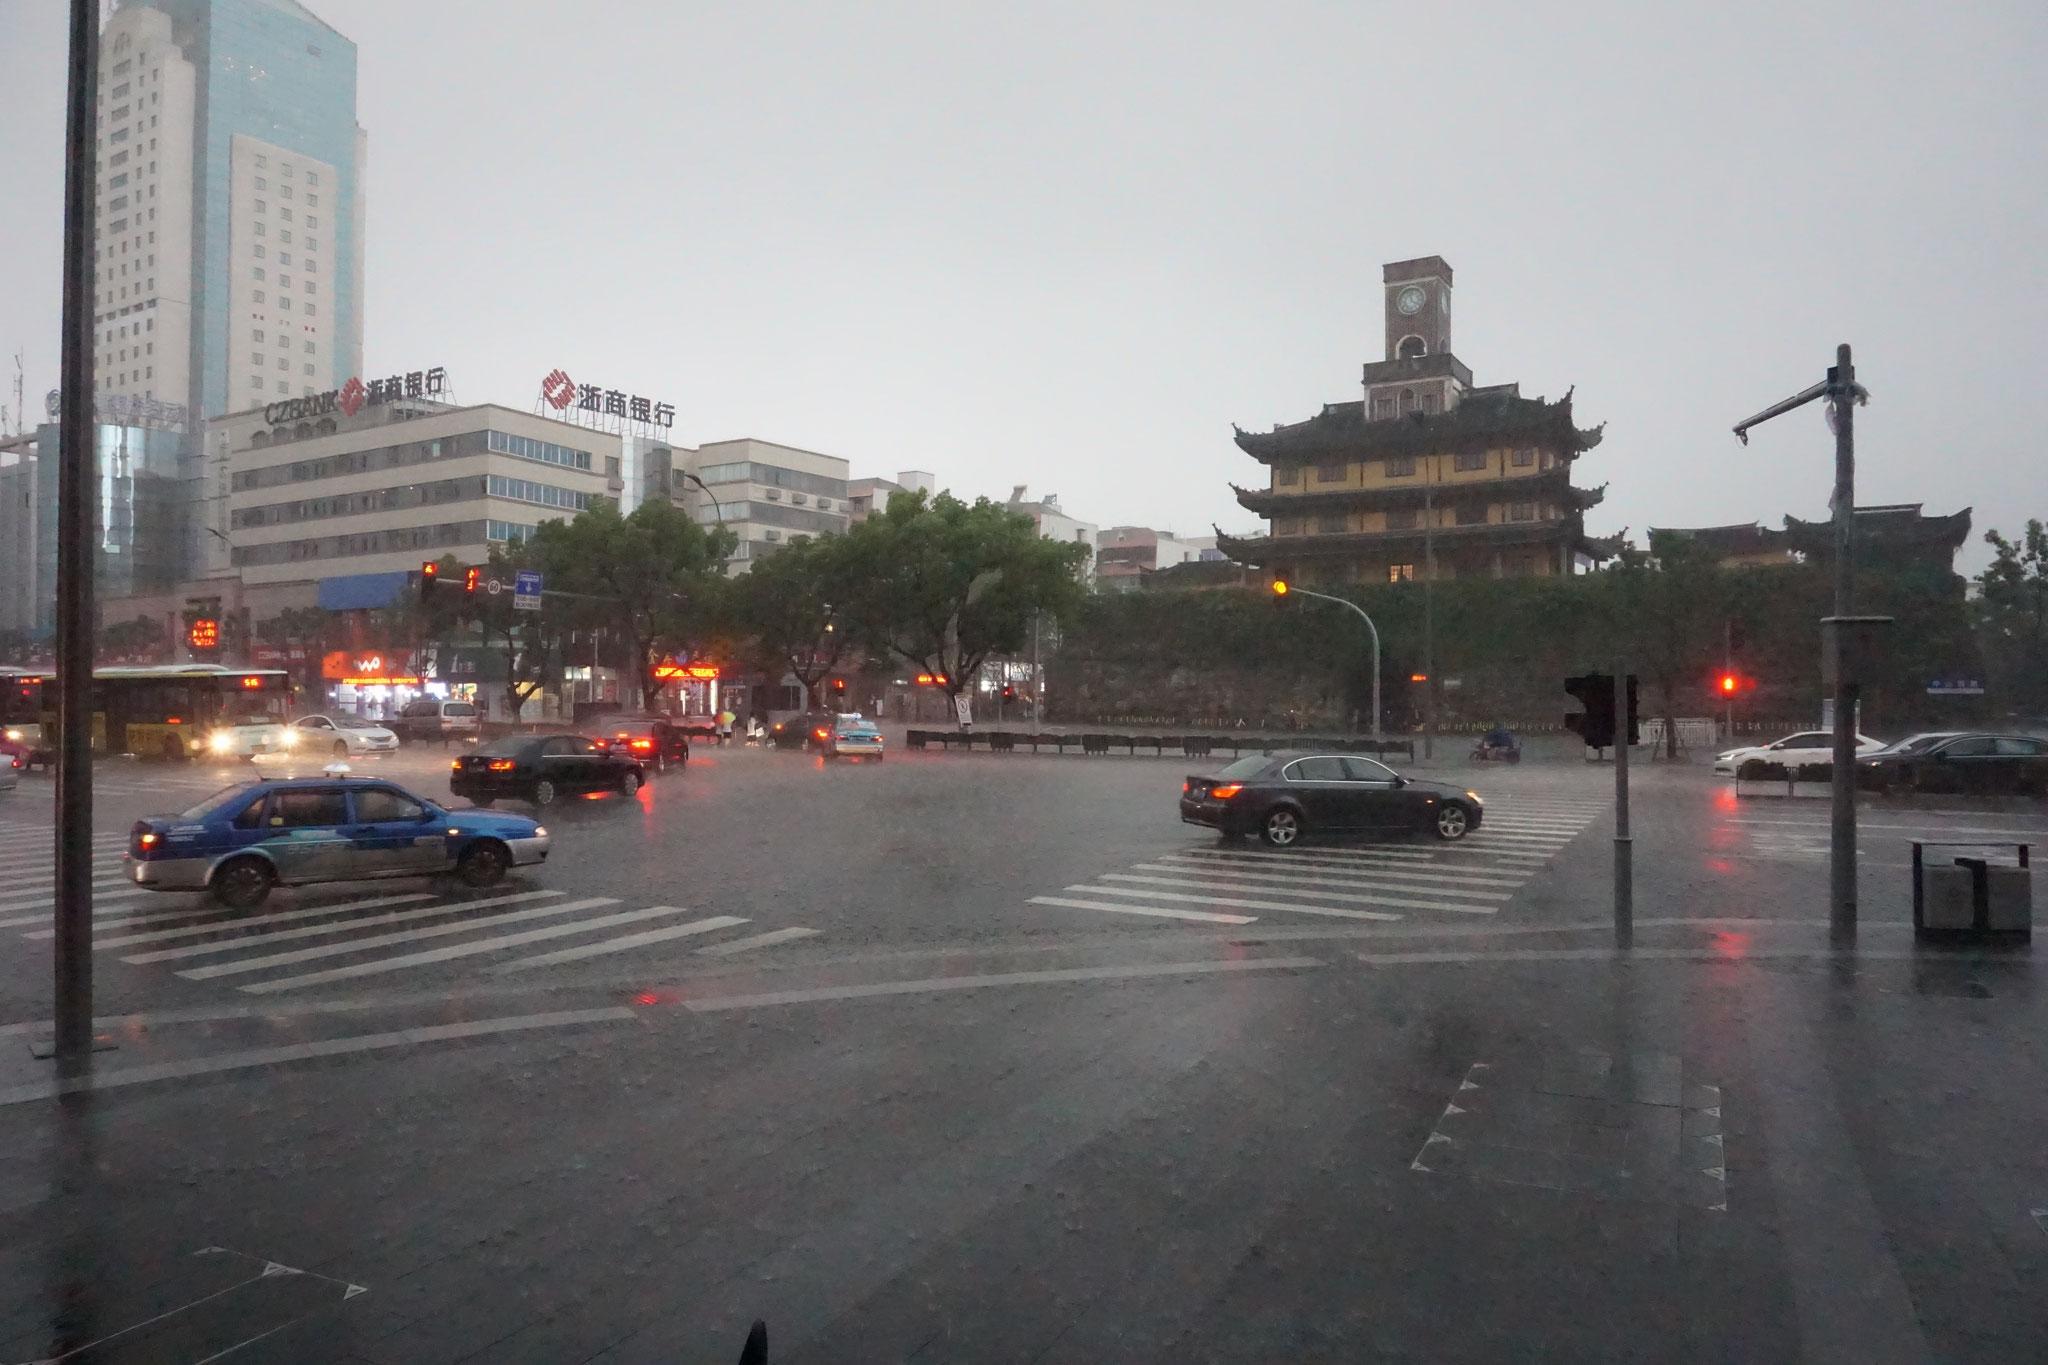 Gulou bei starkem Regen